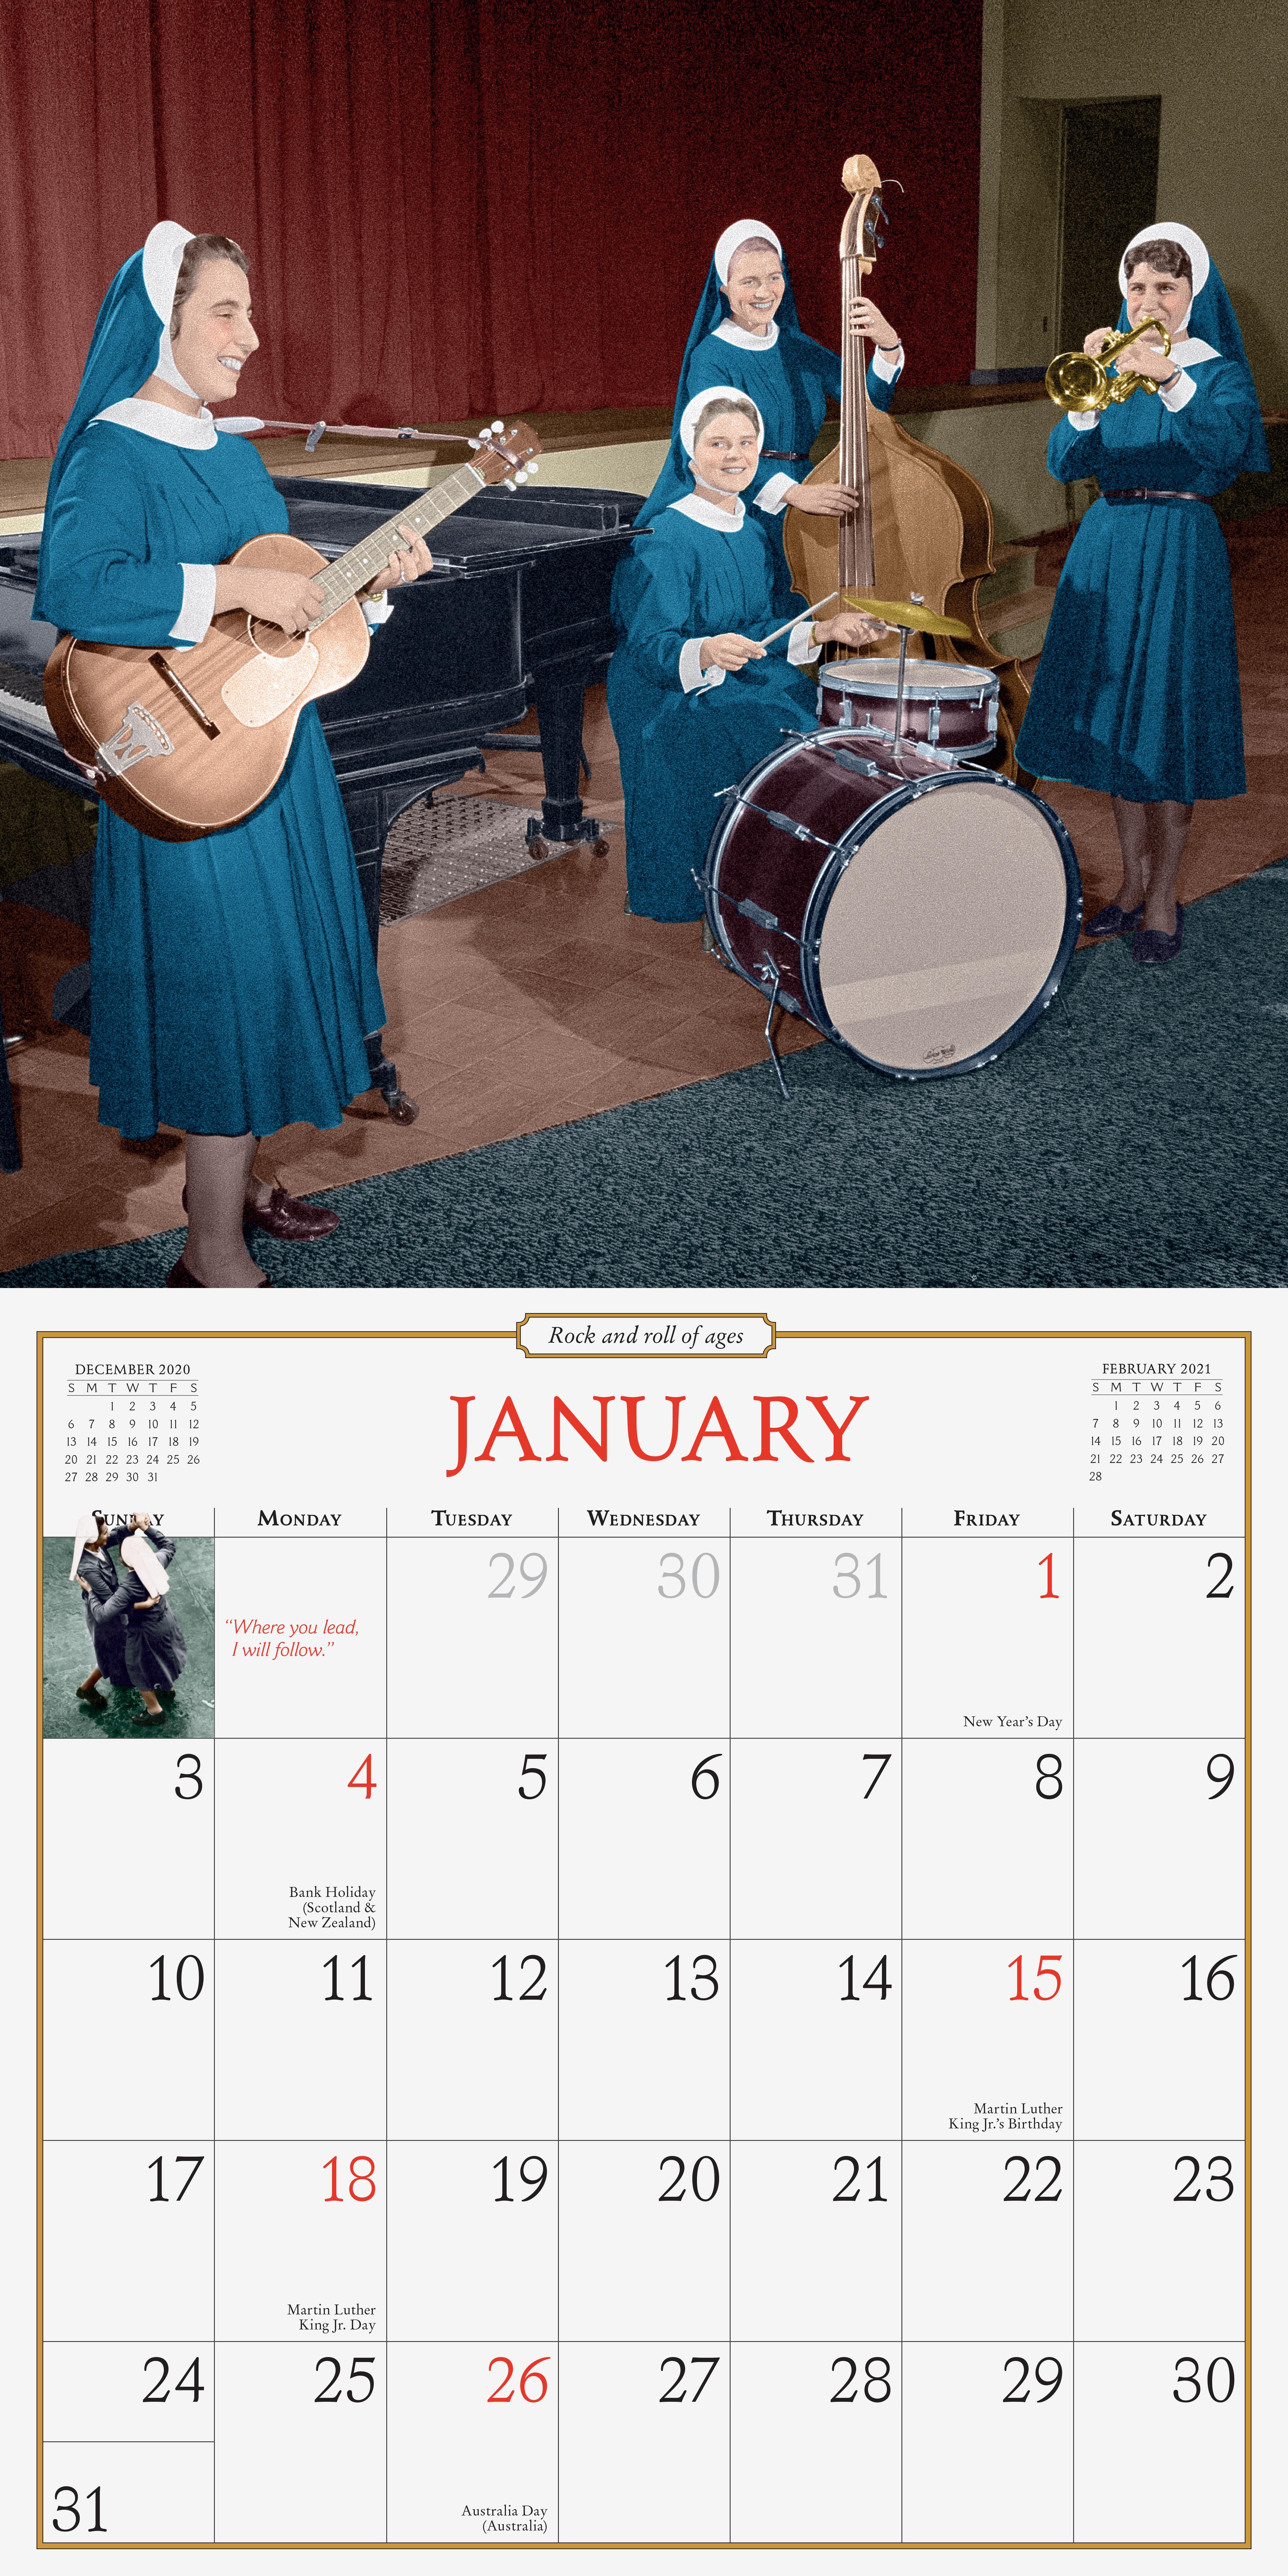 Nuns Having Fun Calendar 2021 Nuns Having Fun Wall Calendar 2021   Workman Publishing